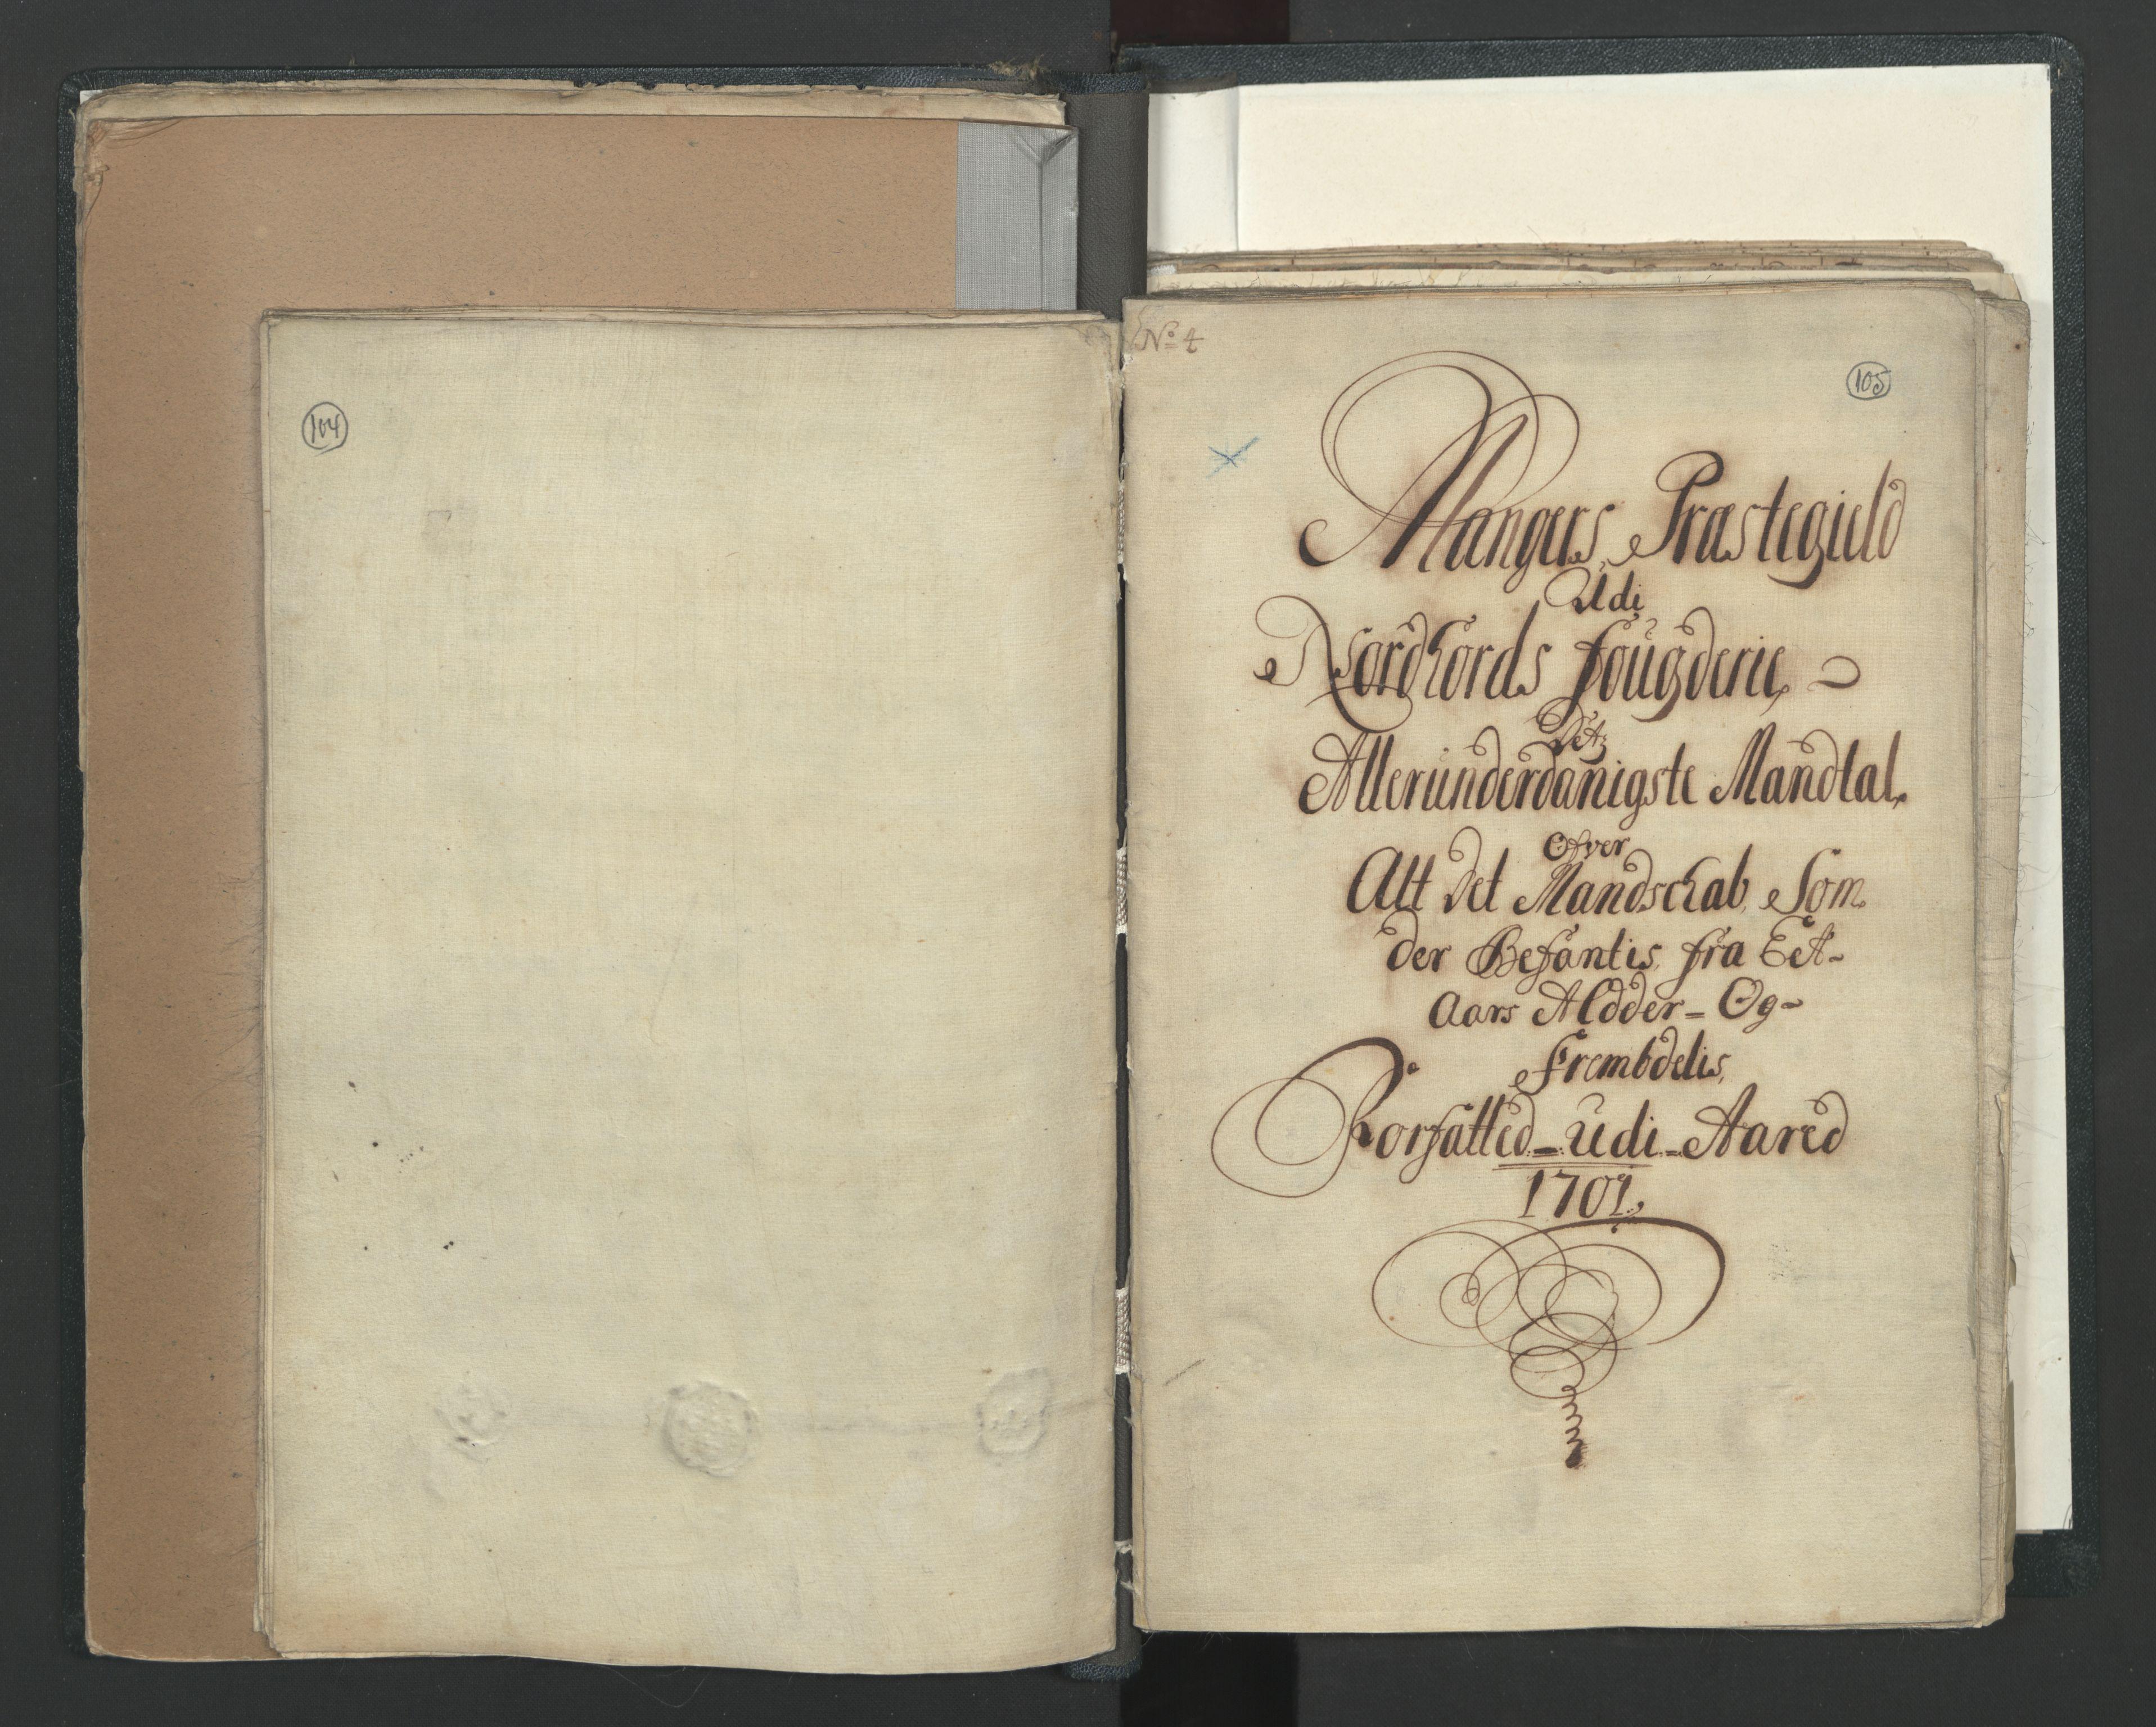 RA, Manntallet 1701, nr. 7: Nordhordland og Voss fogderi, 1701, s. 104-105